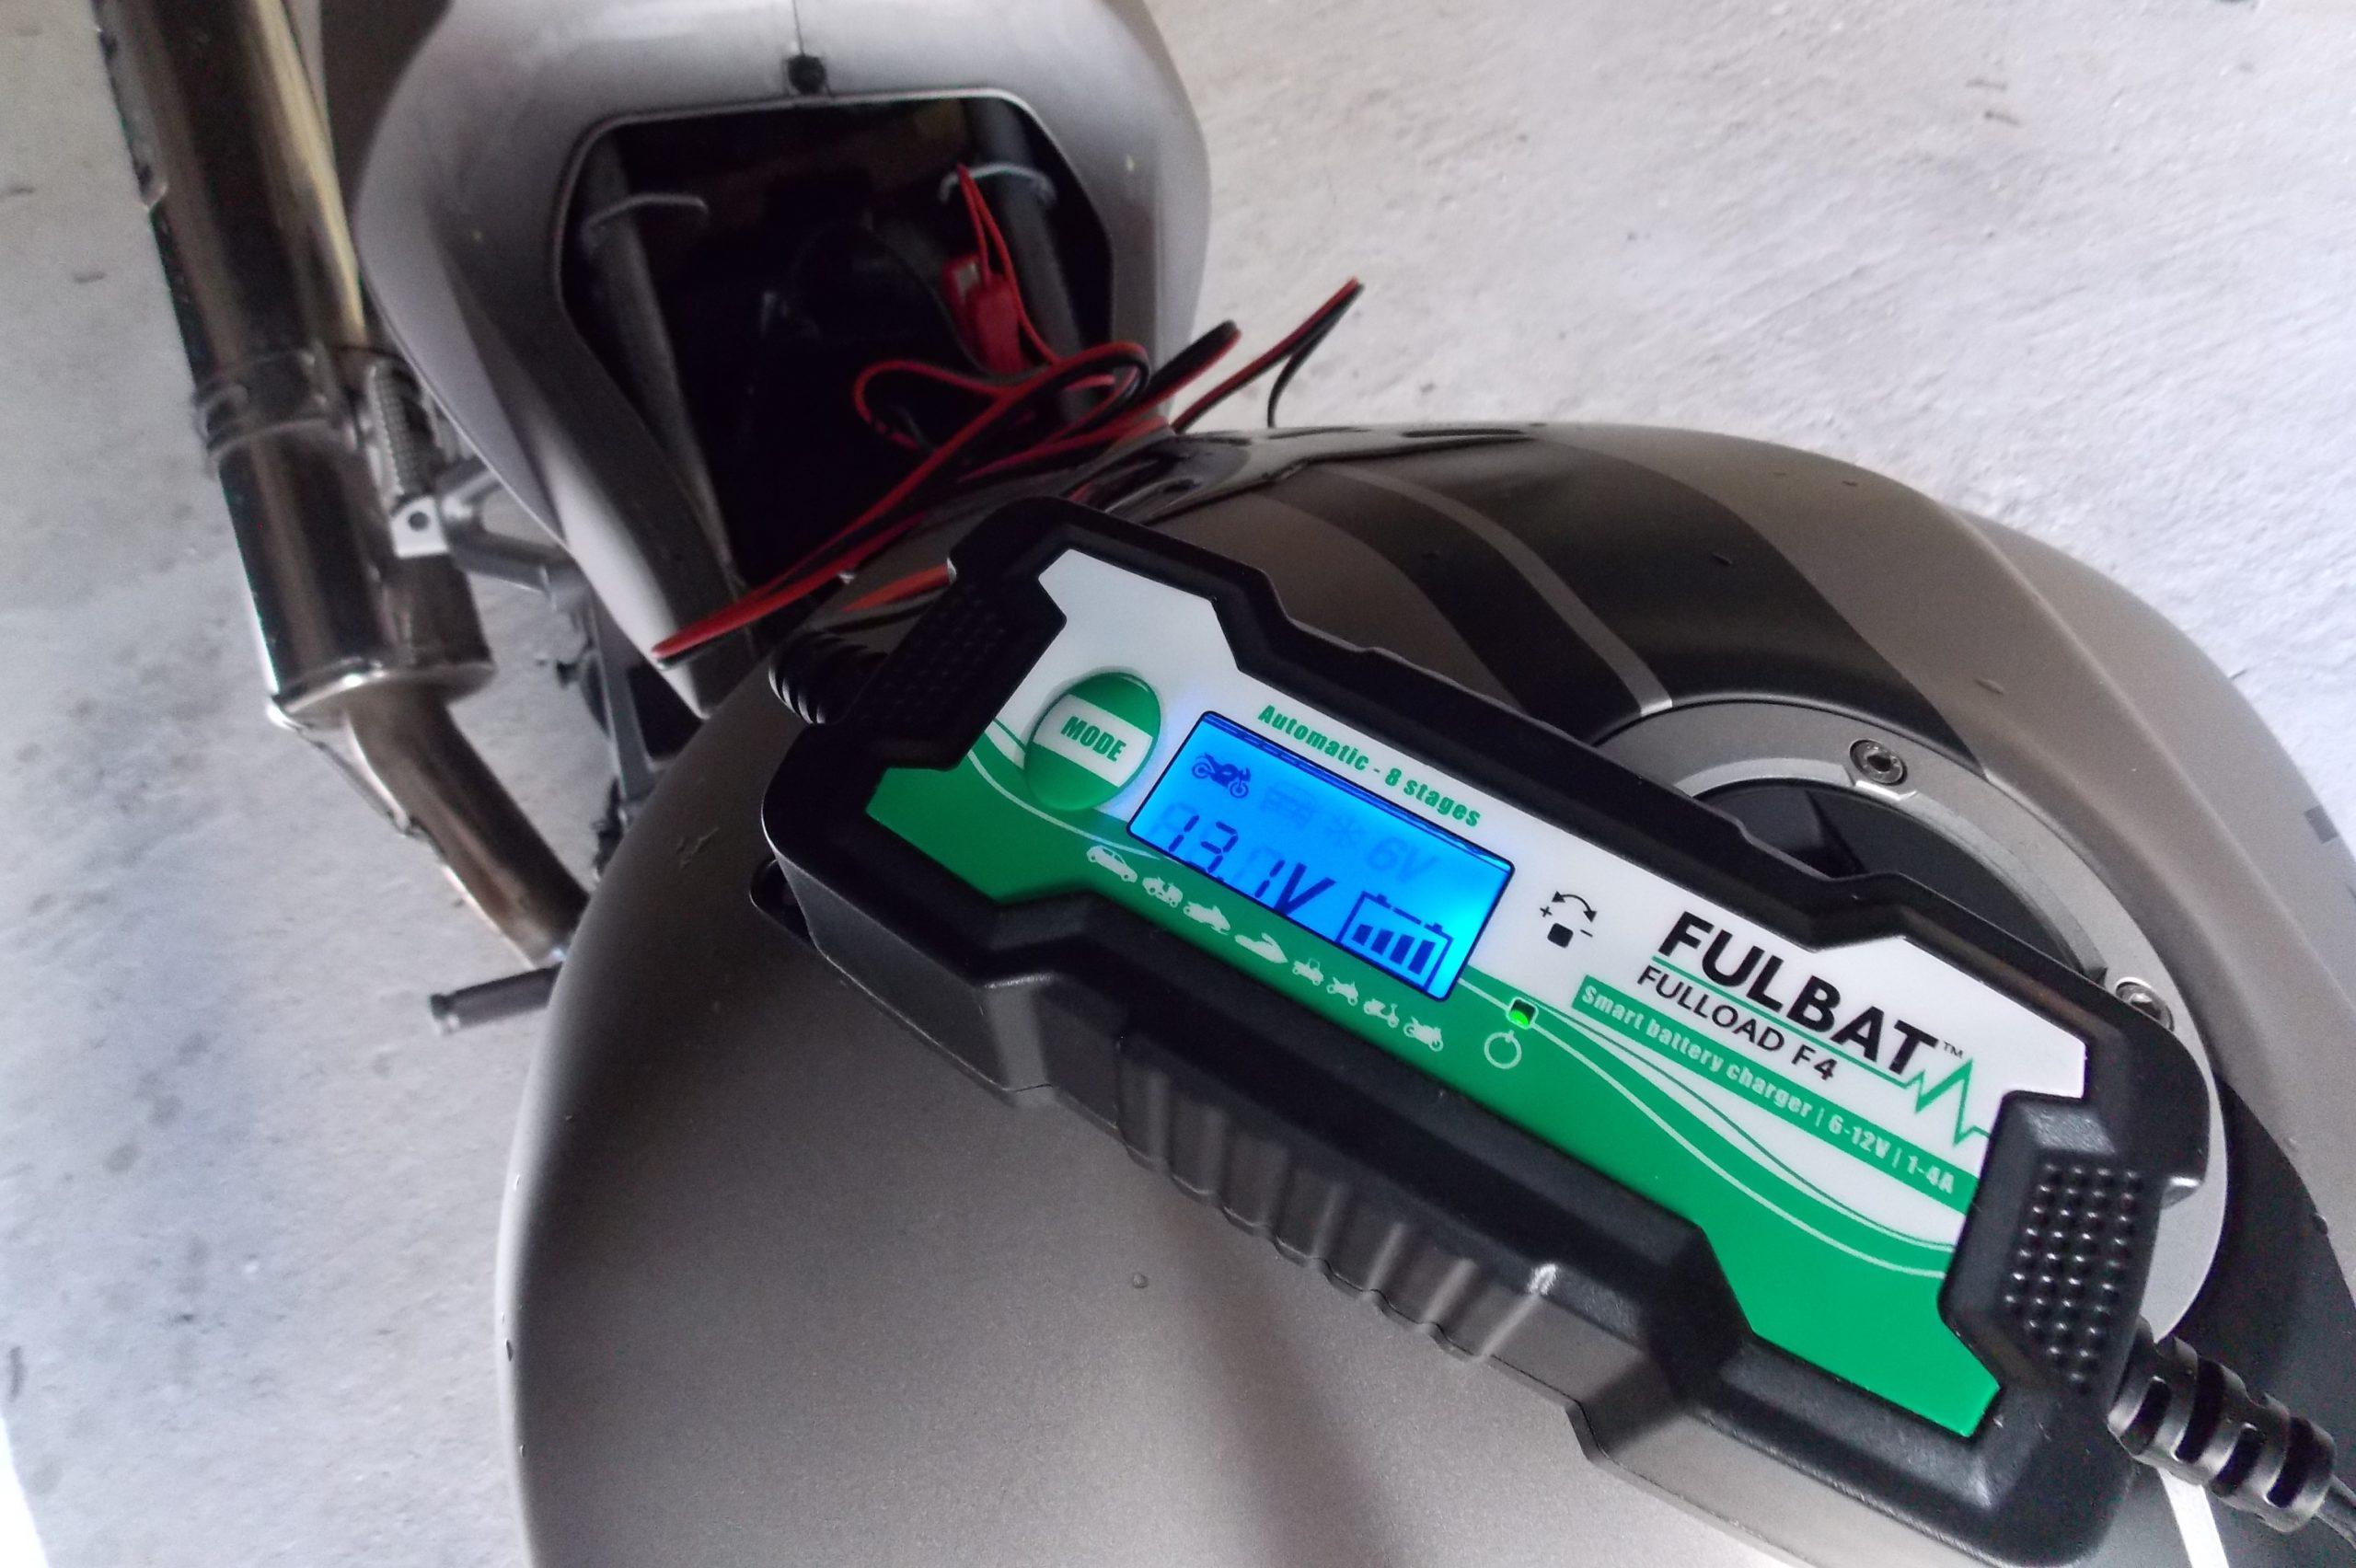 FULLOAD-F4-charging-garage